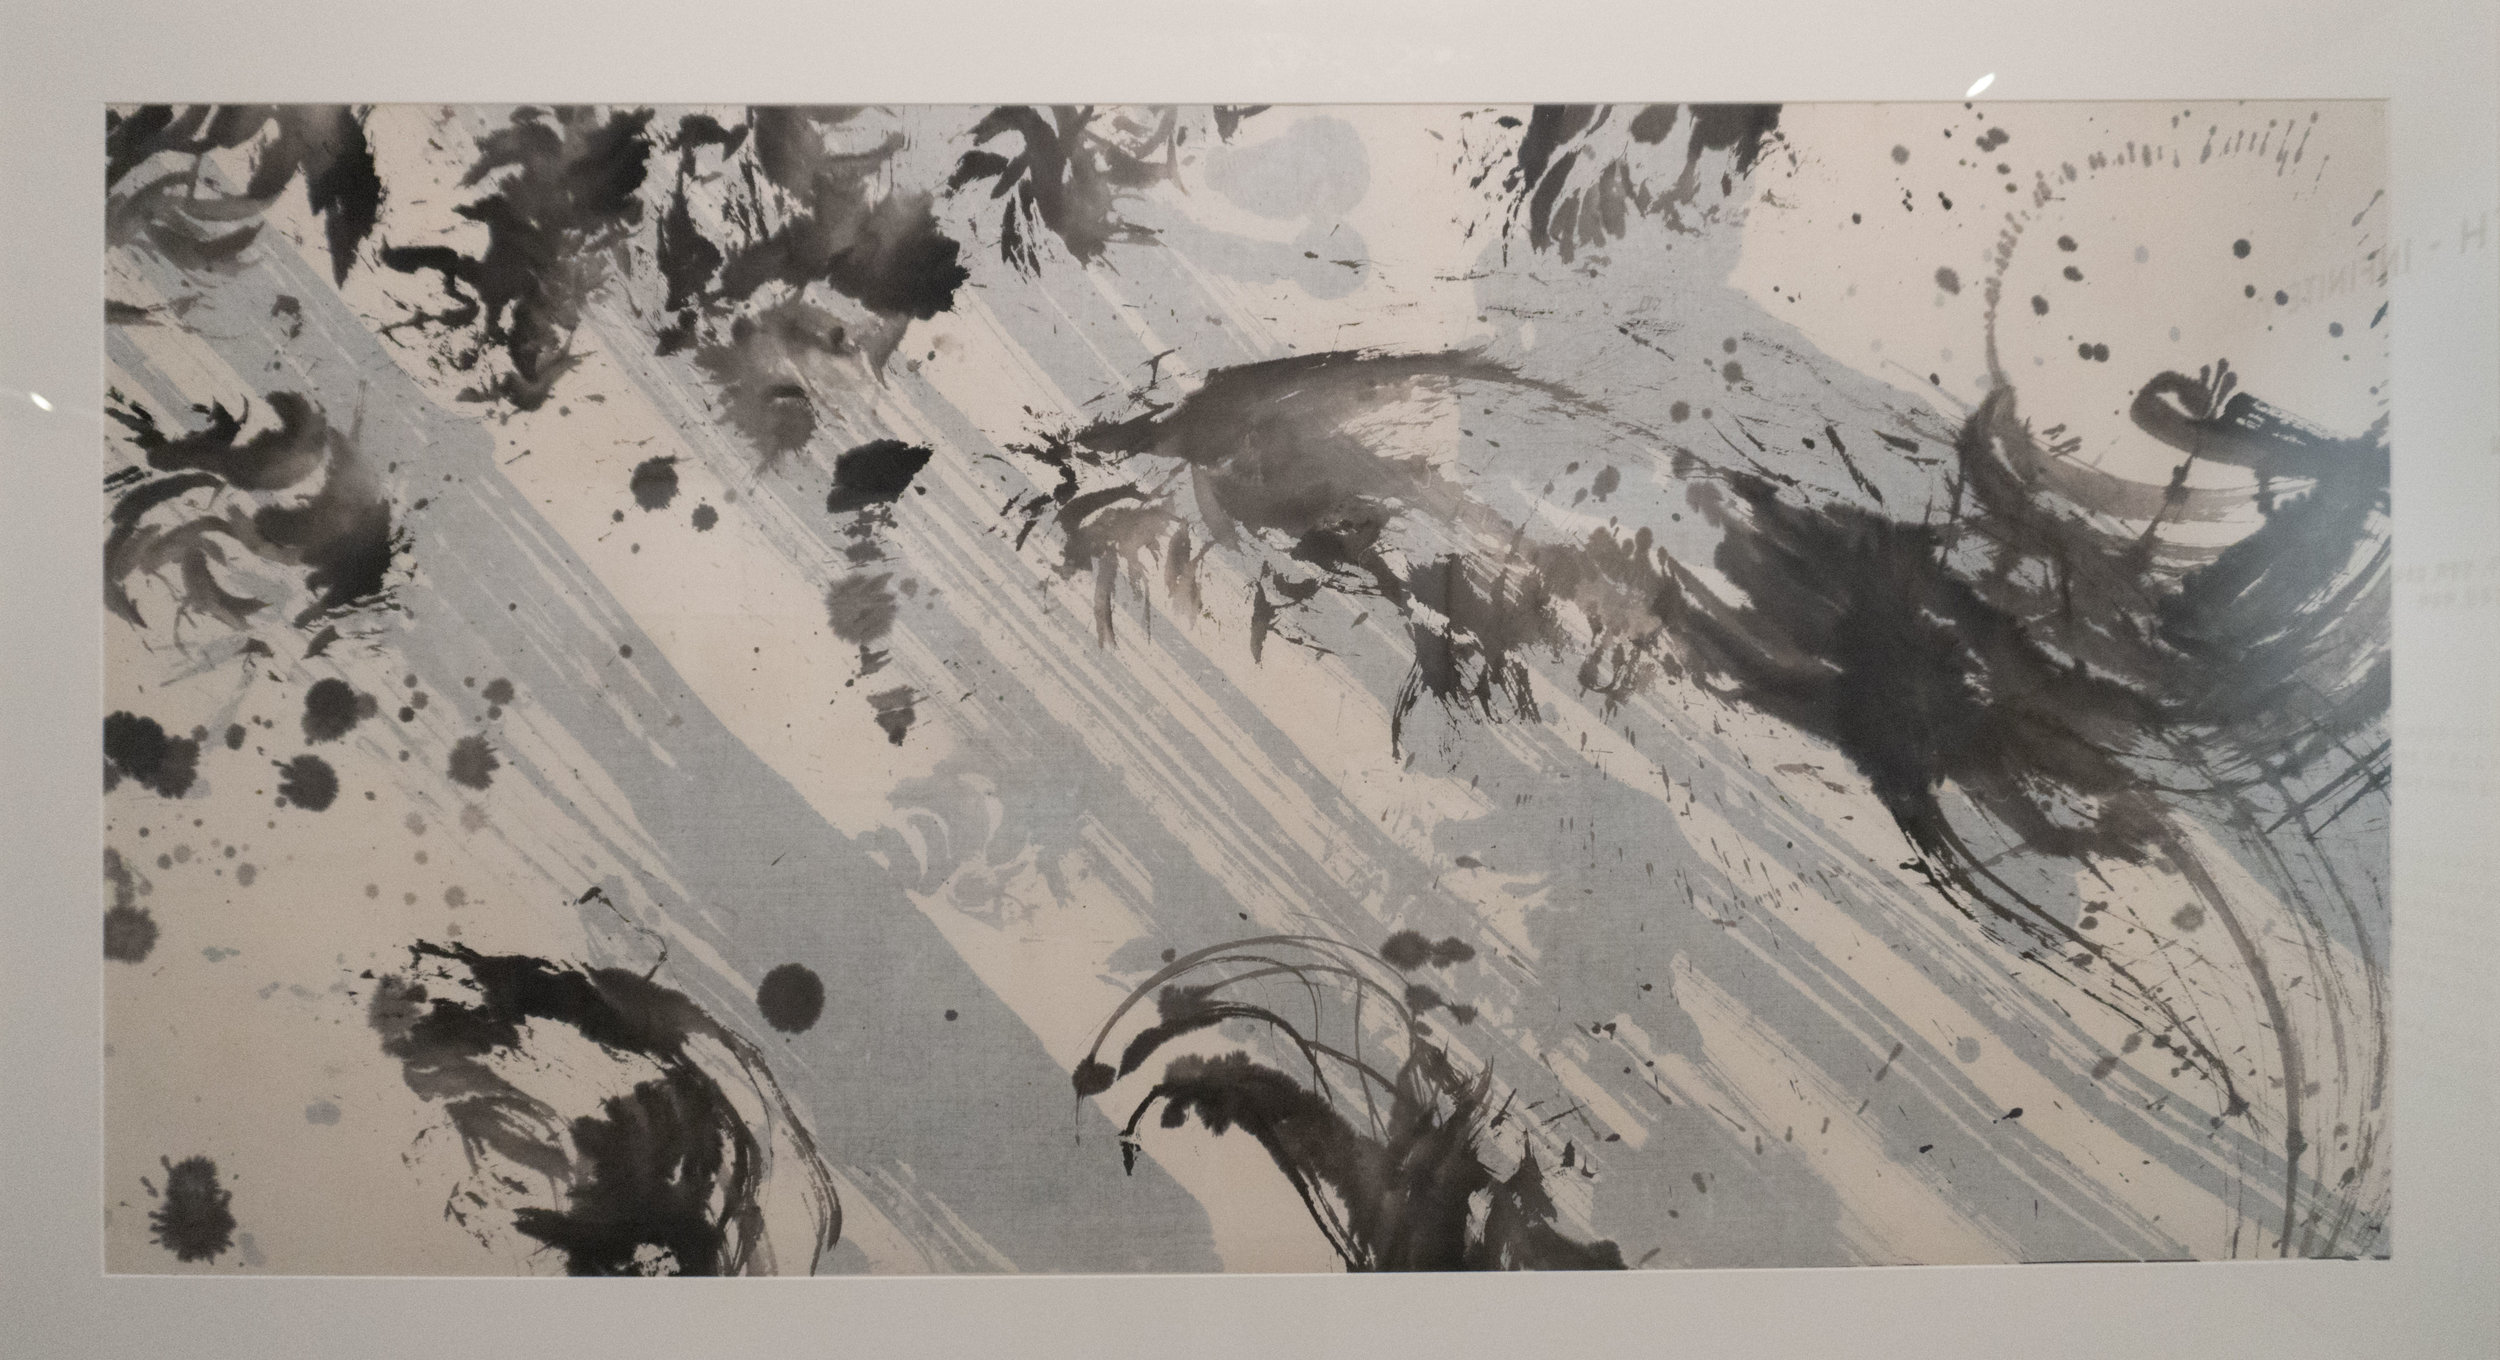 Choi Ildan 최일단 b.1936   Whirlwind회오리 바람 2007 Ink on hanji paper 28 x 53 in